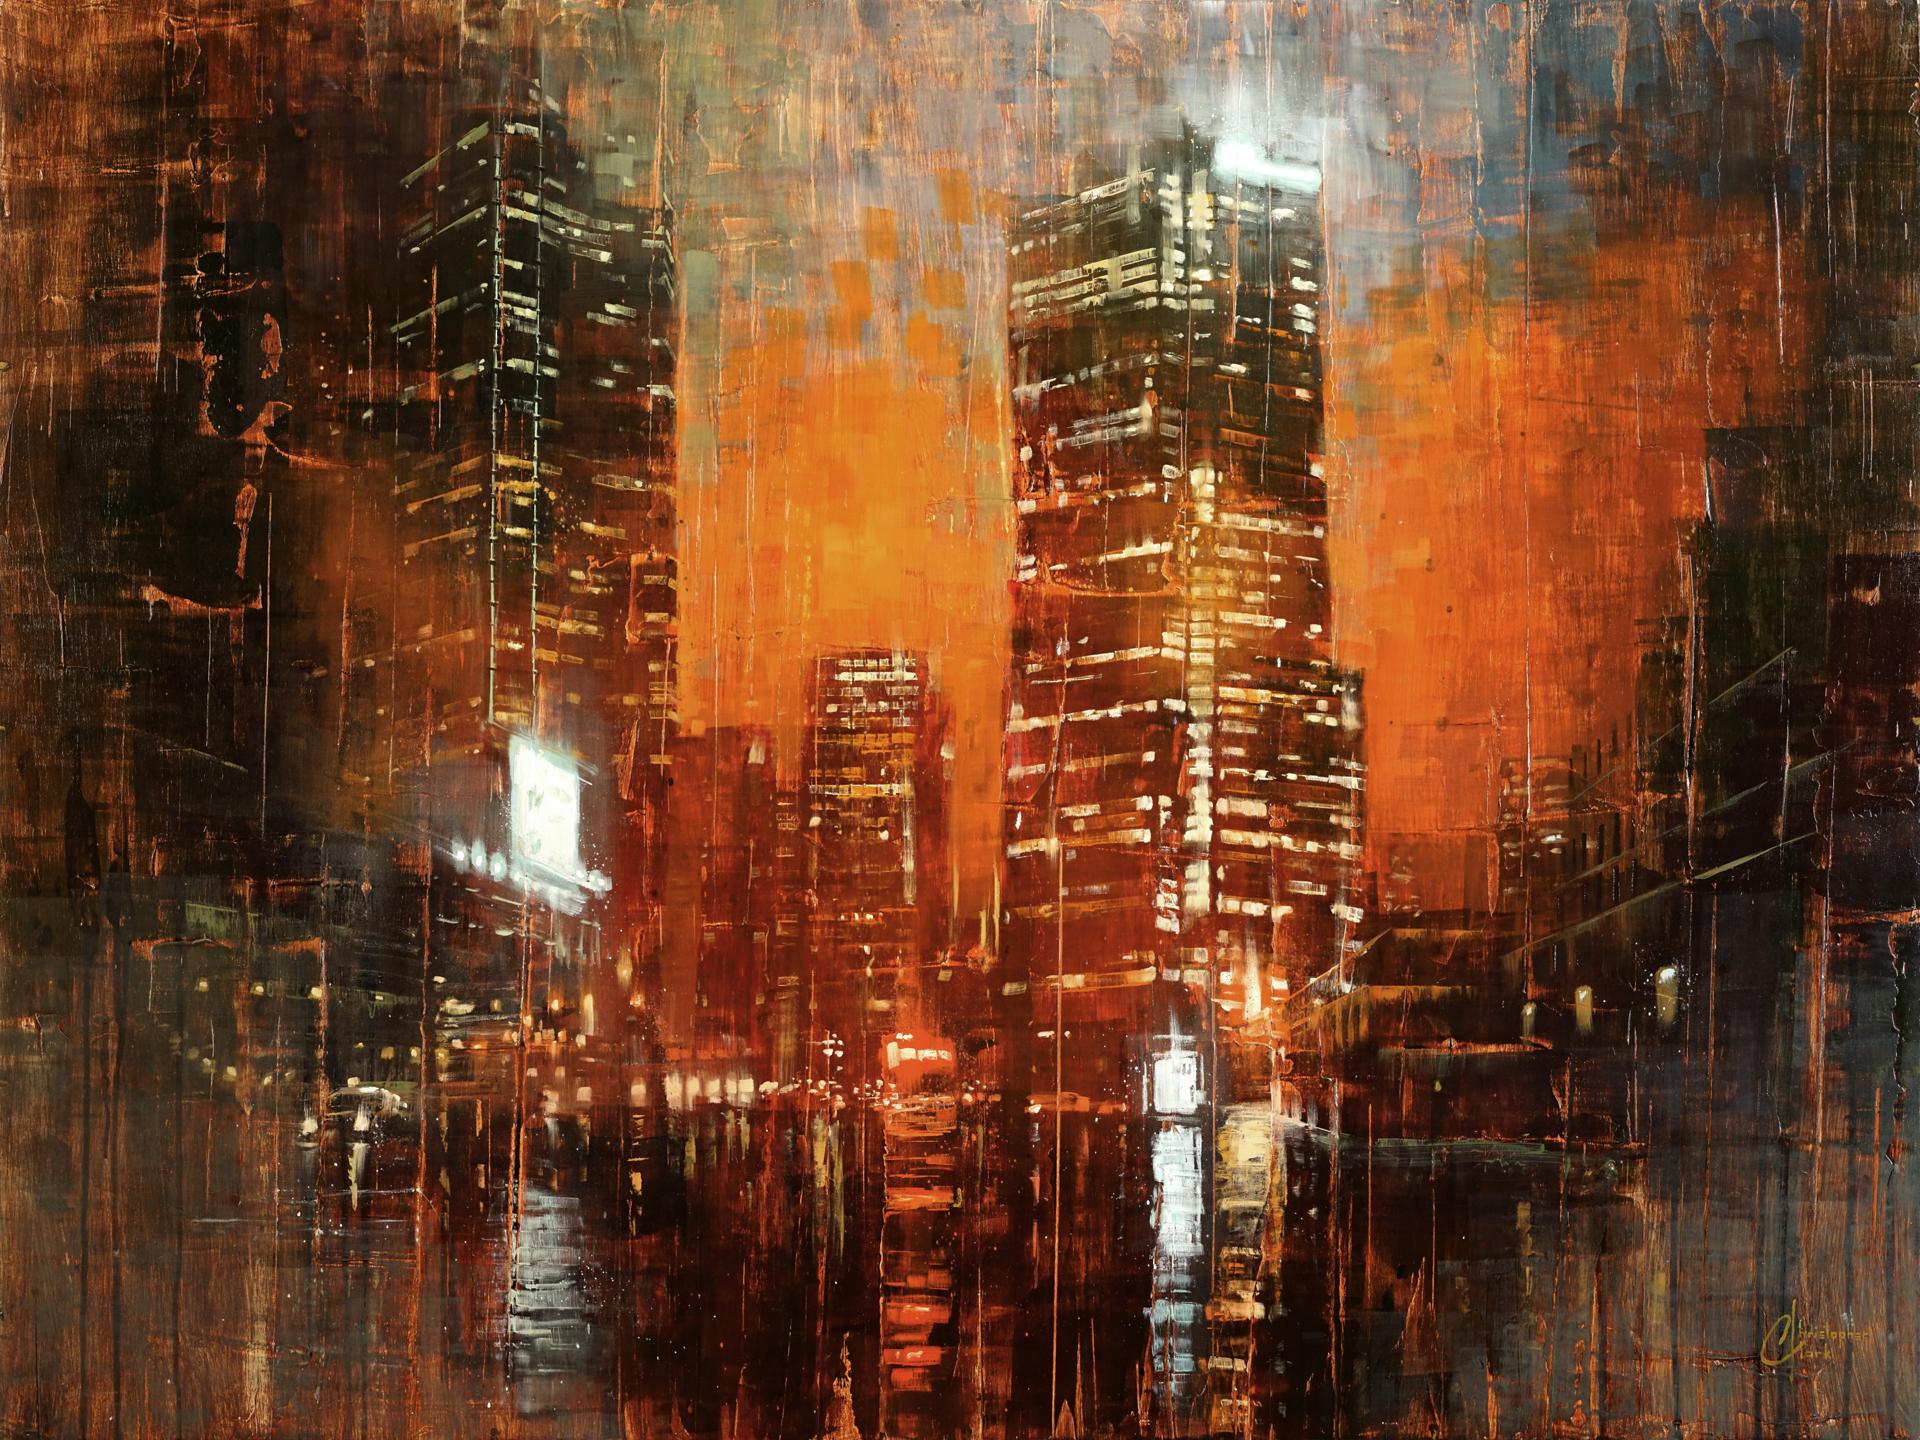 Denver - City Lights III by Christopher Clark